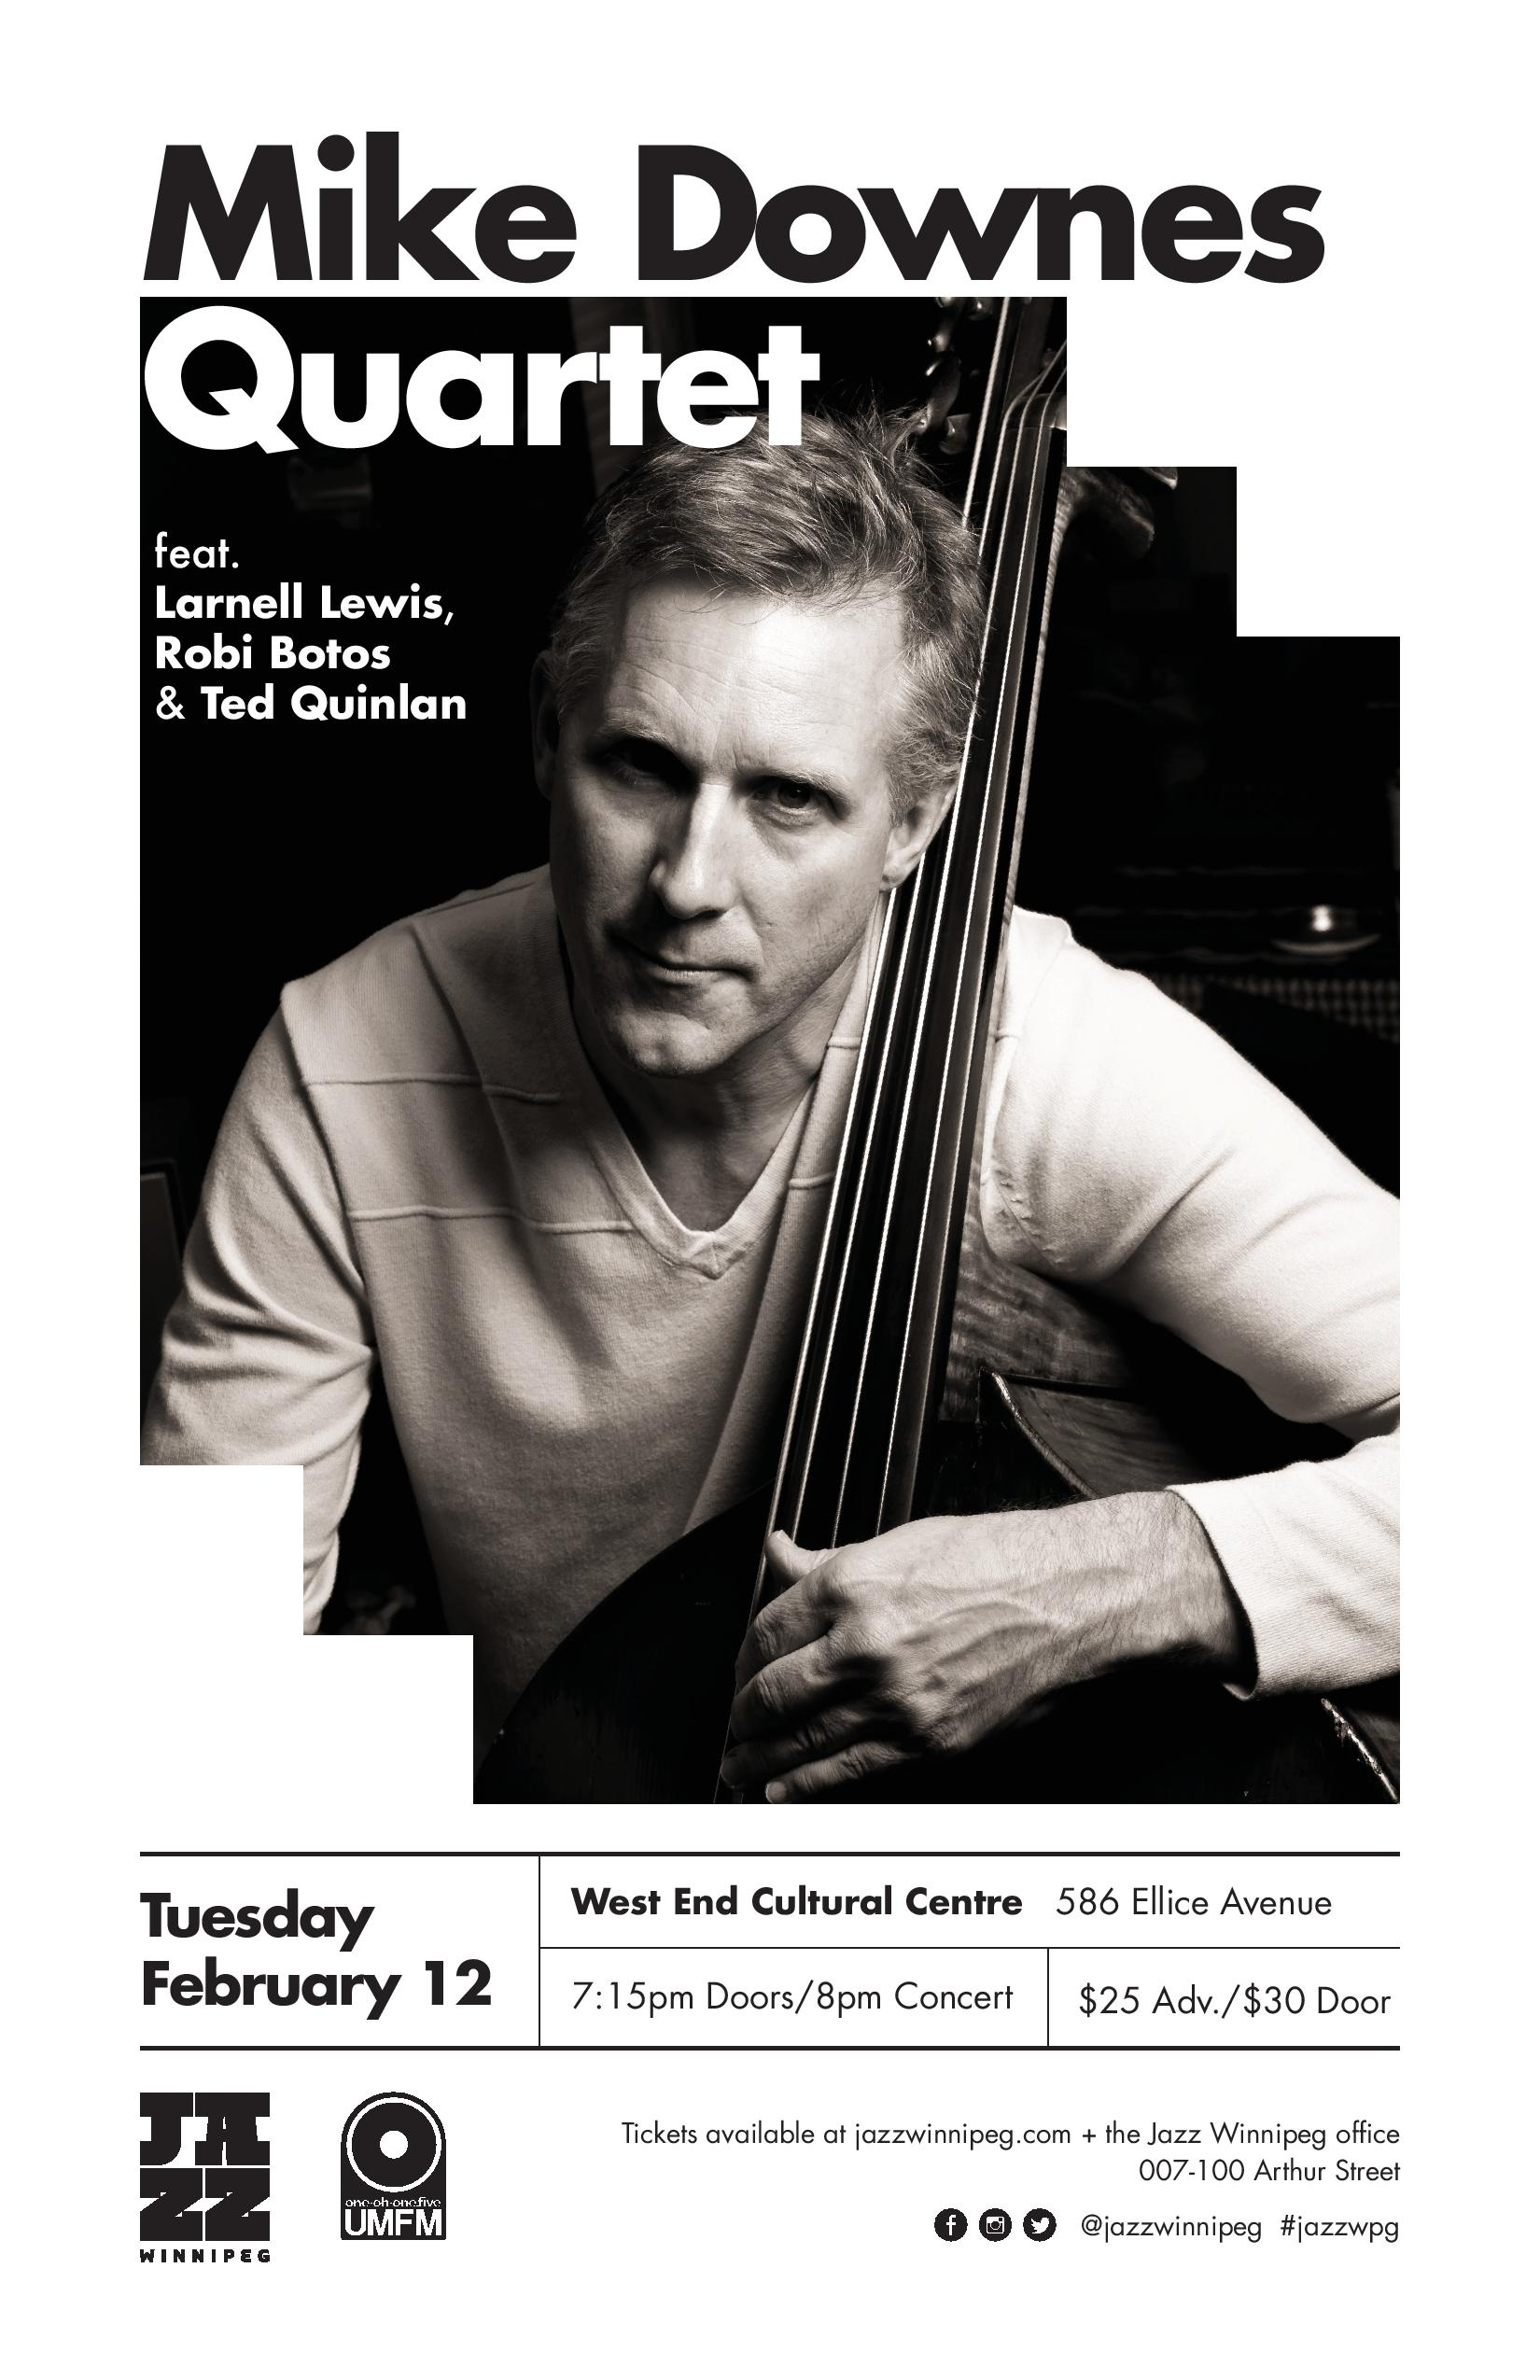 190212 Mike Downes Quartet.jpg